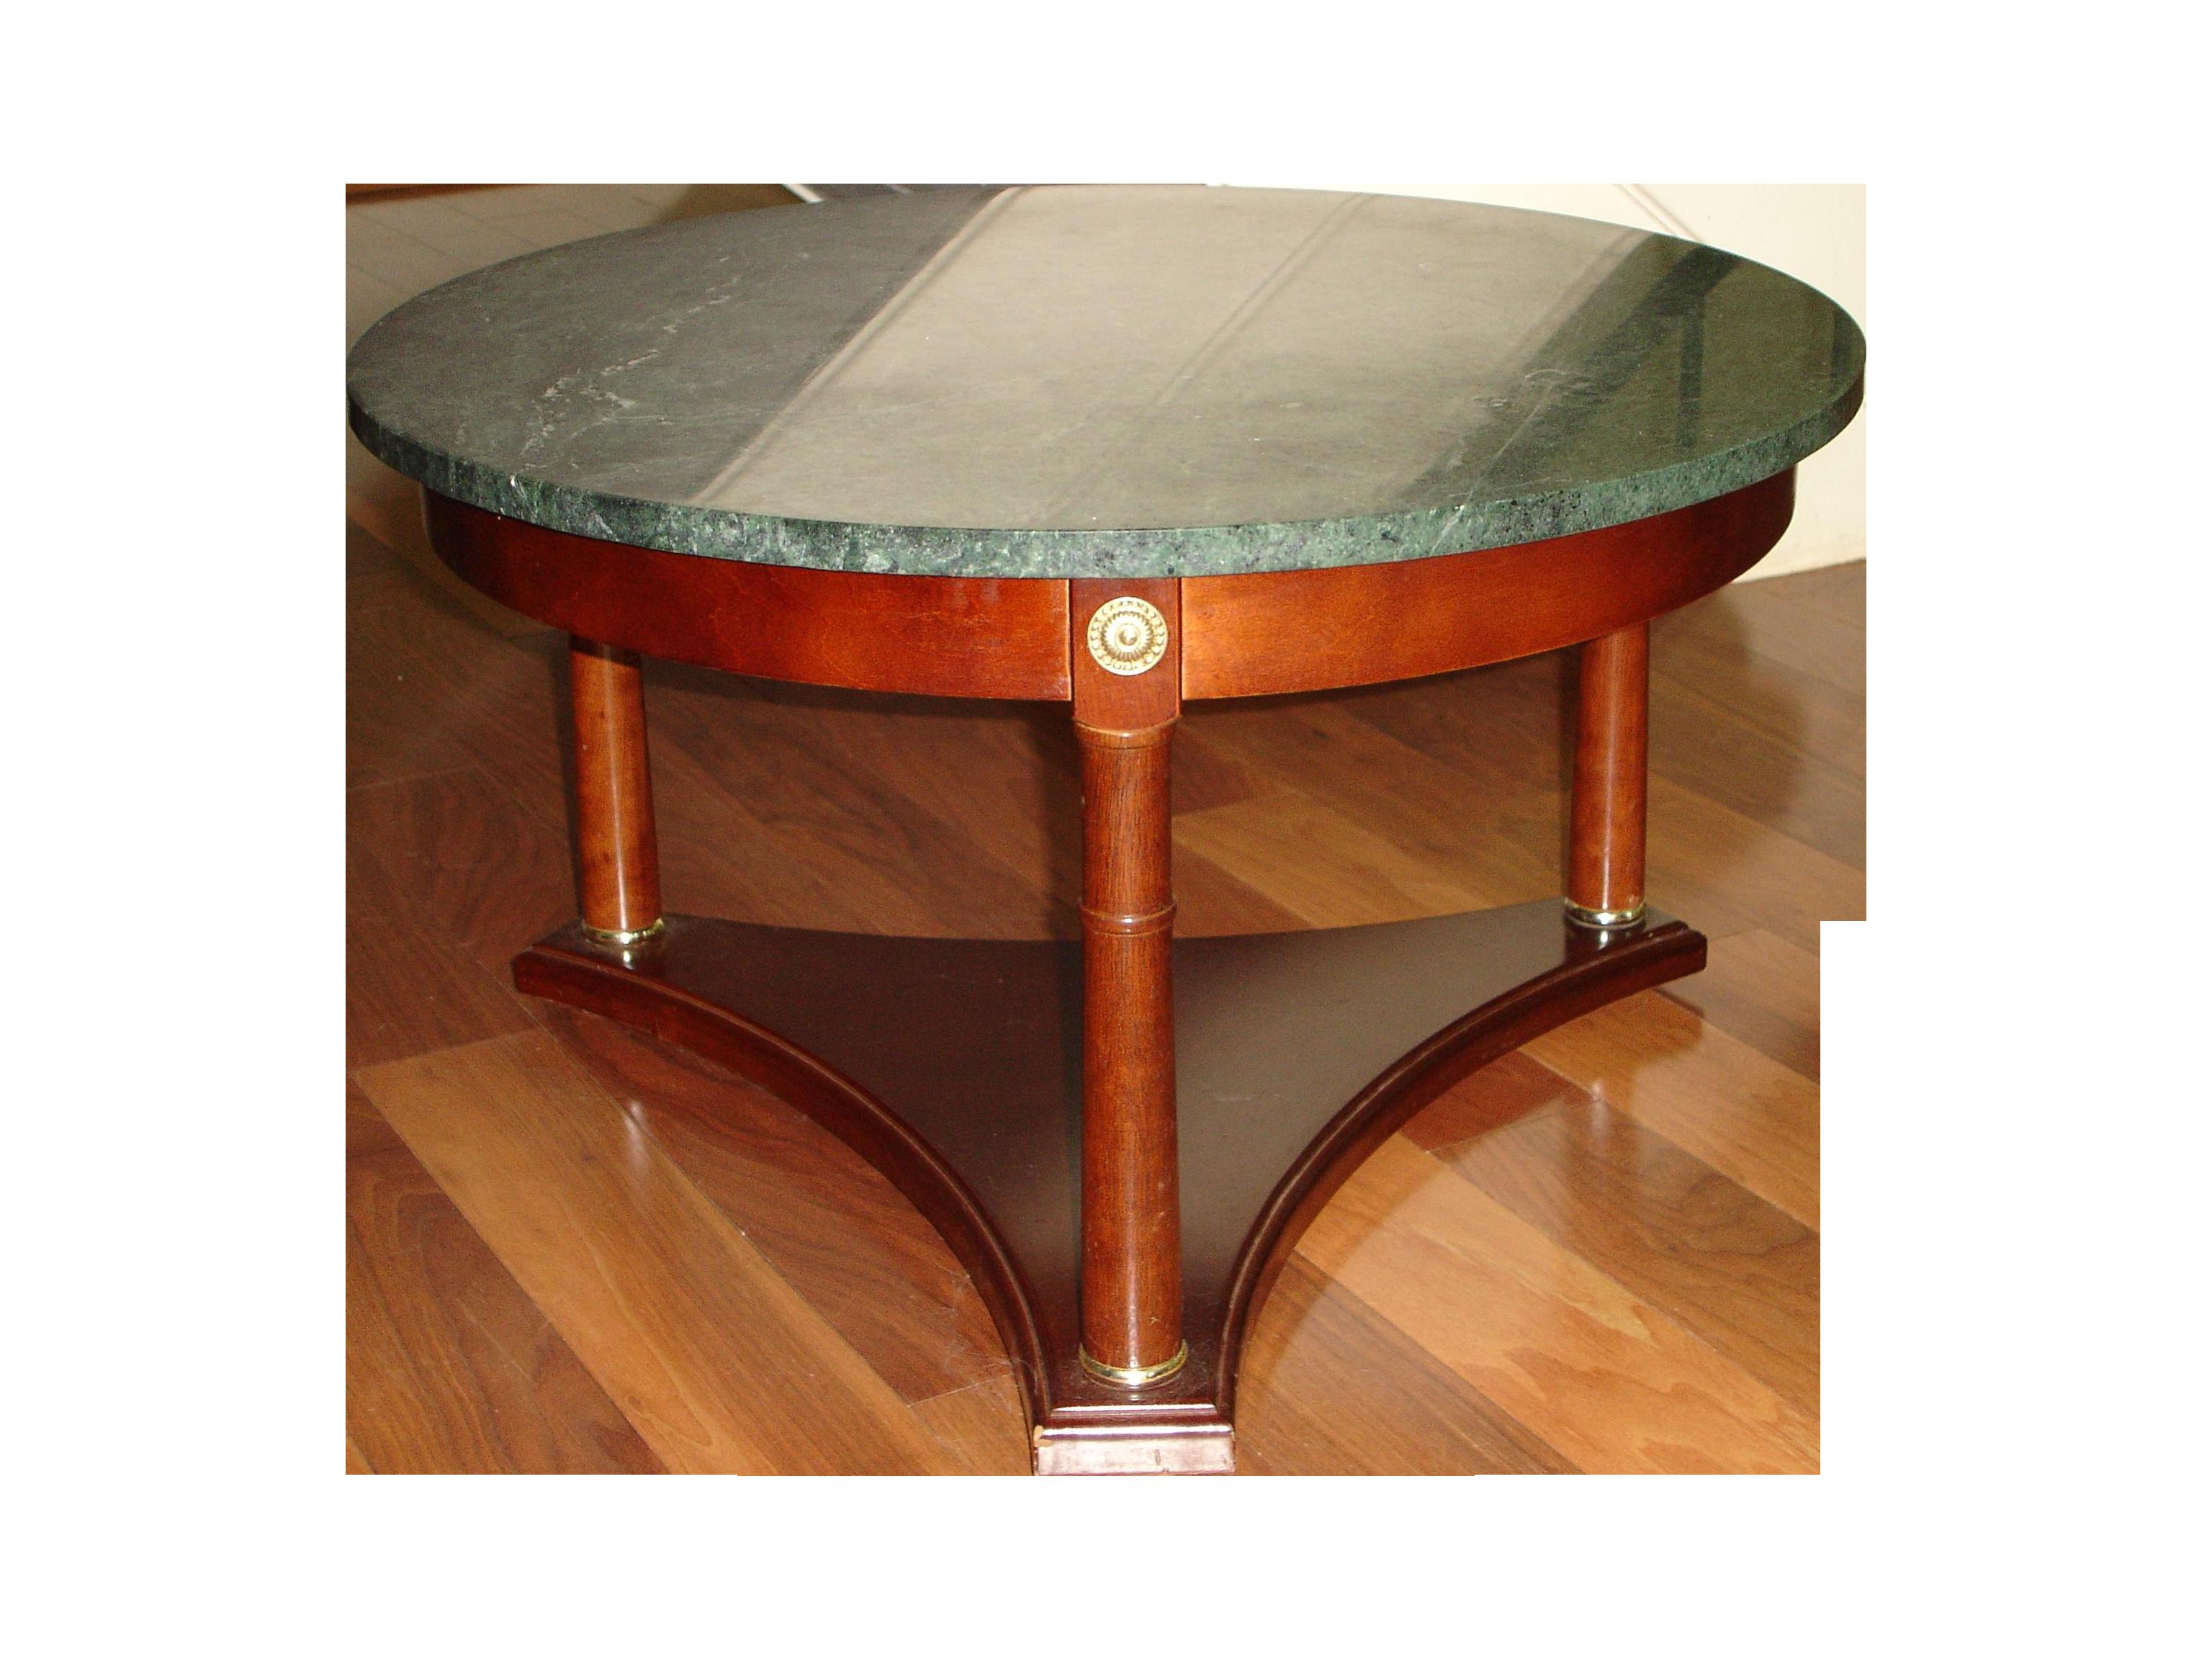 Vintage Green Marble Top U0026 Mahogany Coffee Table   Image 1 ...